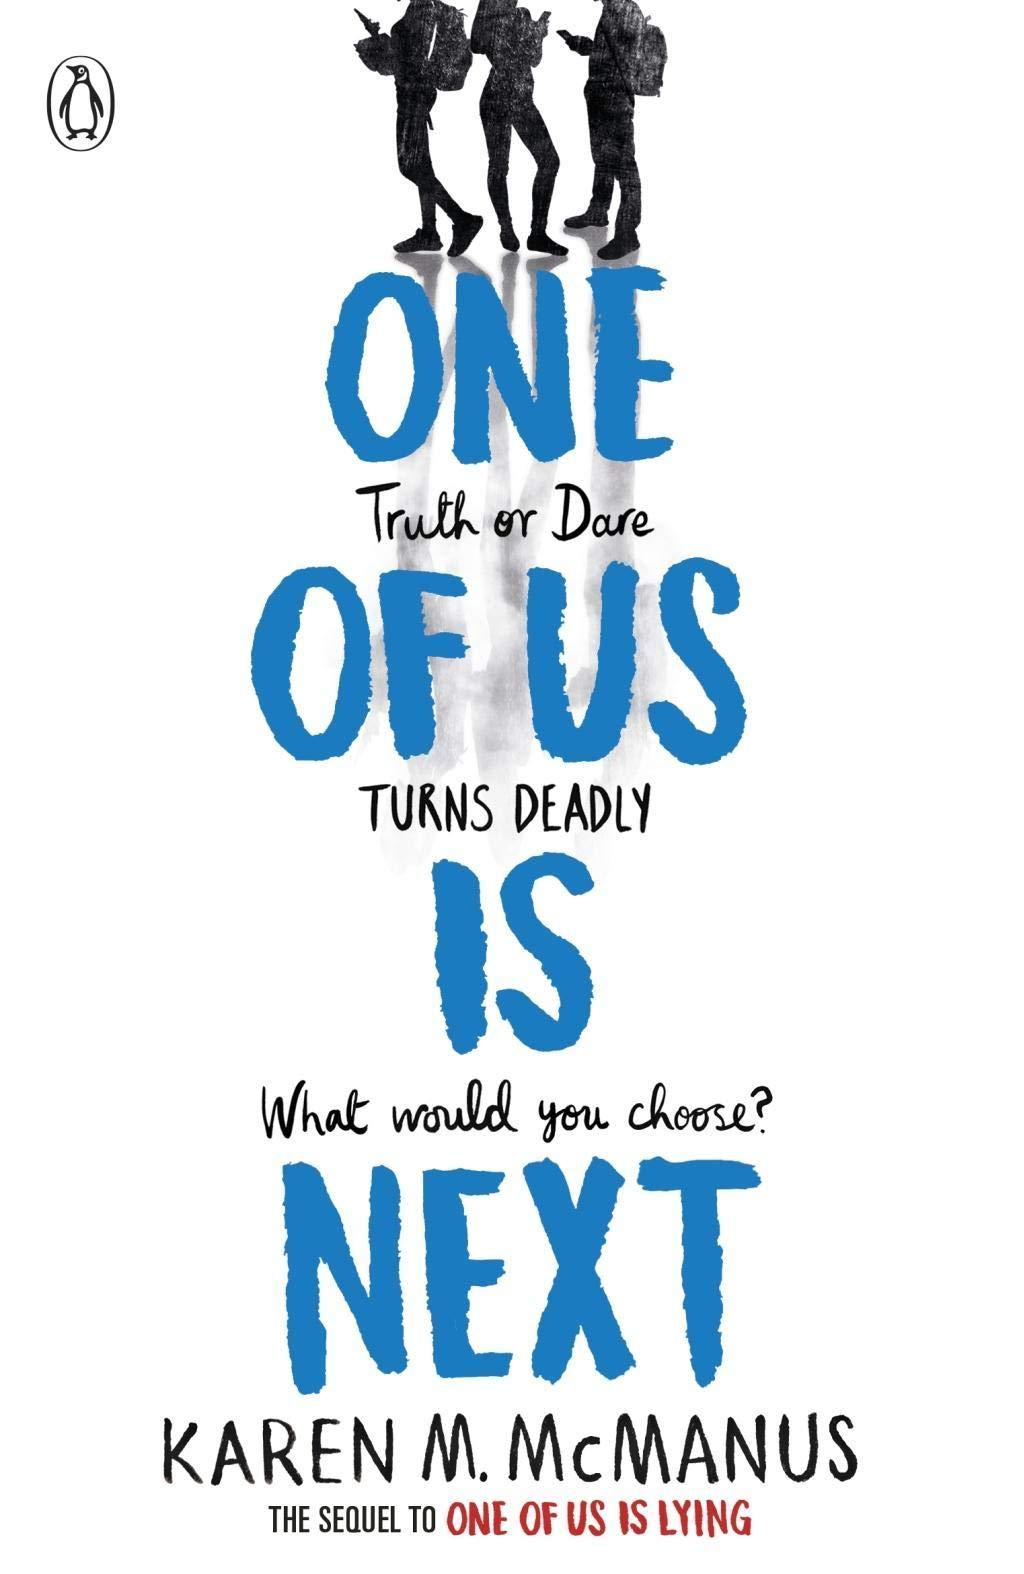 One Of Us Is Next: Amazon.co.uk: McManus, Karen M.: Books